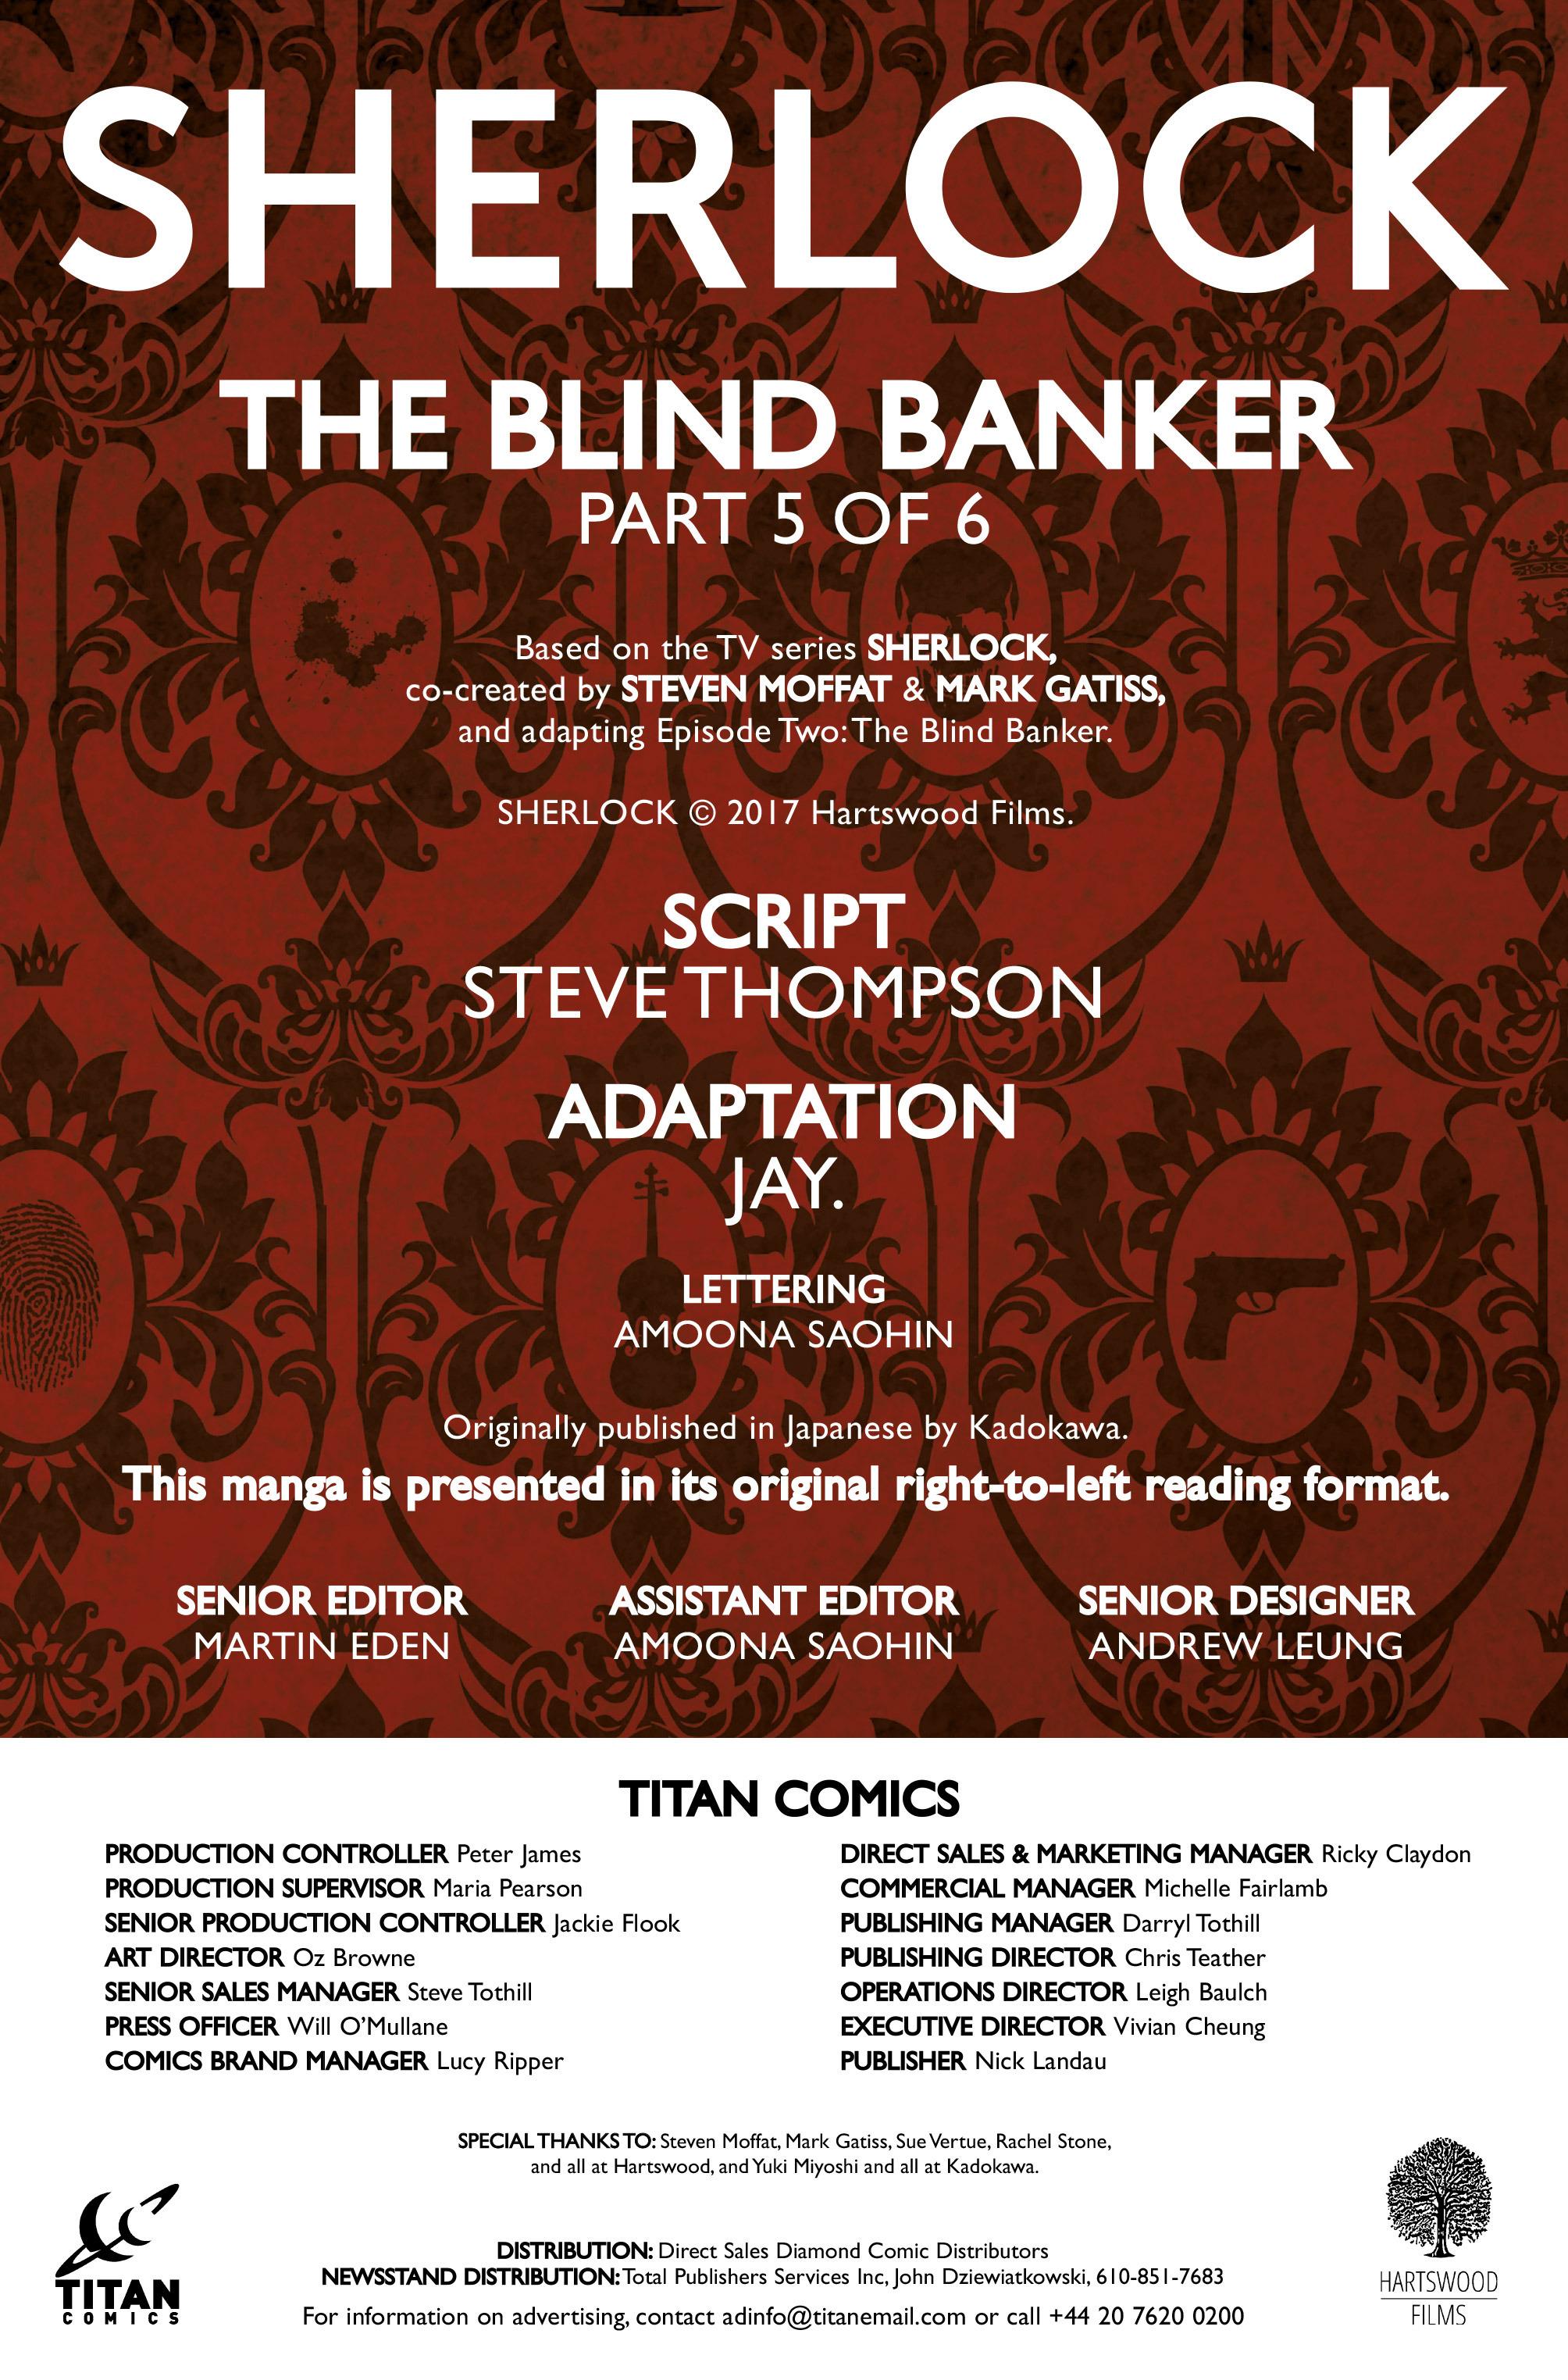 Read online Sherlock: The Blind Banker comic -  Issue #5 - 4